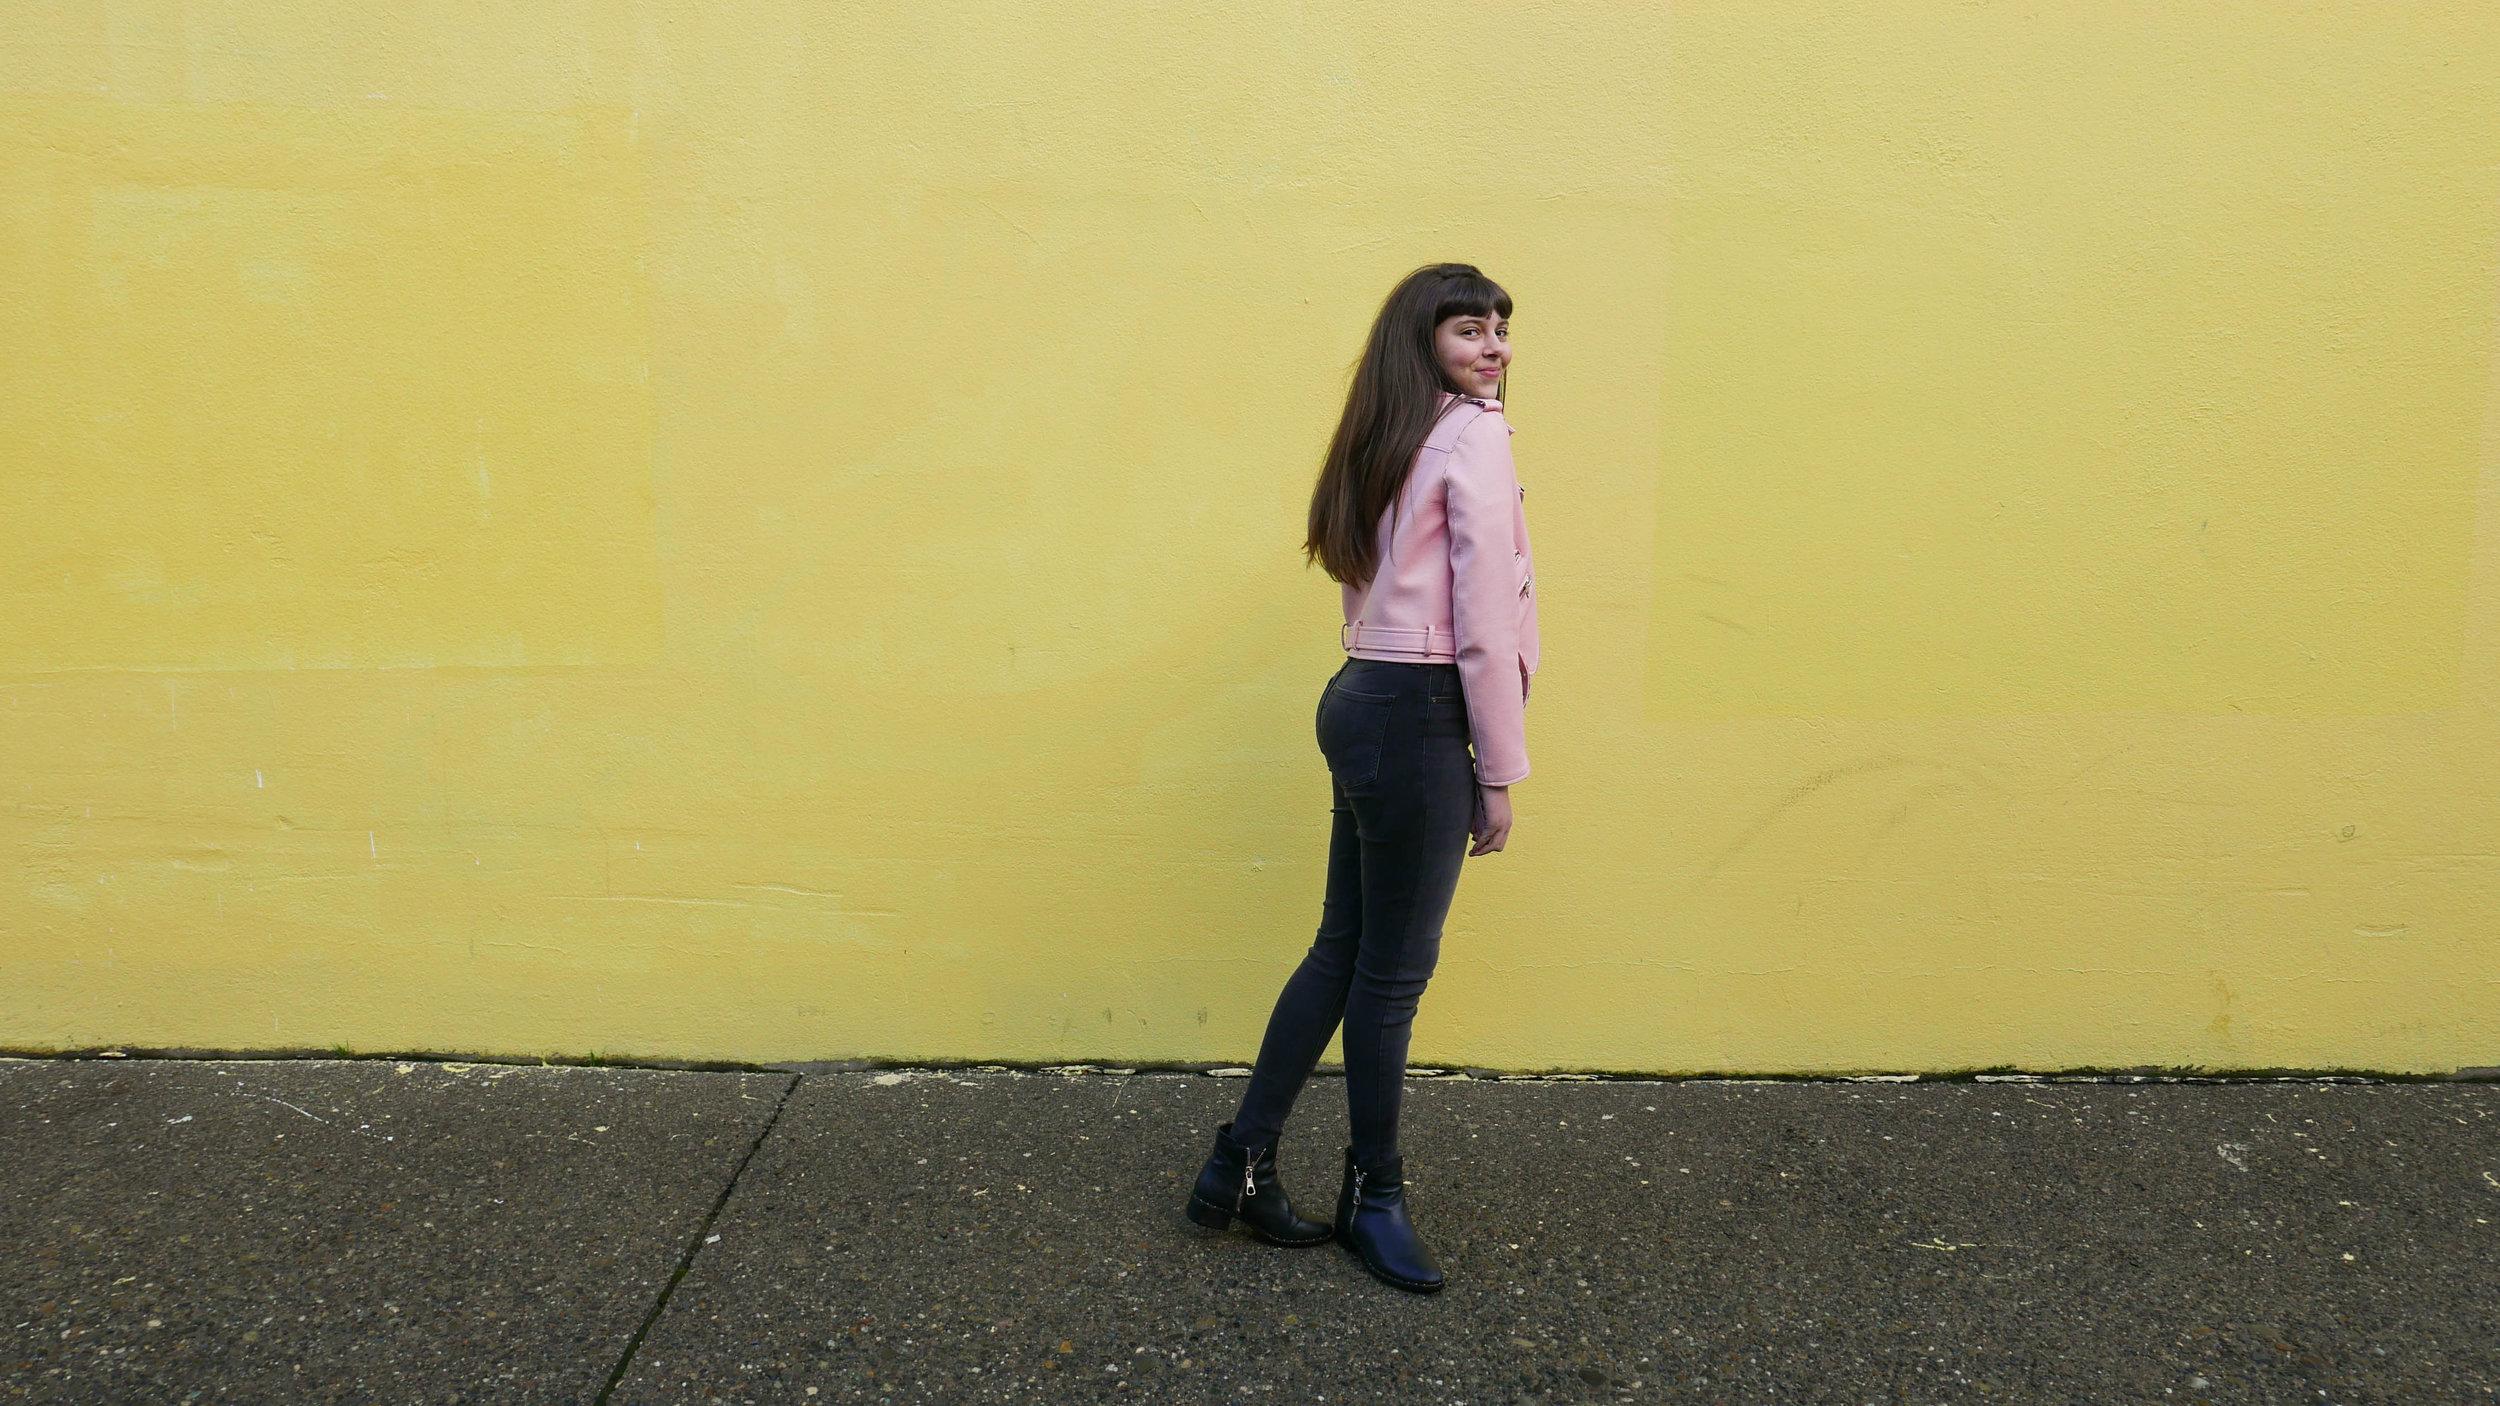 Seattleteenager-1332017.jpg